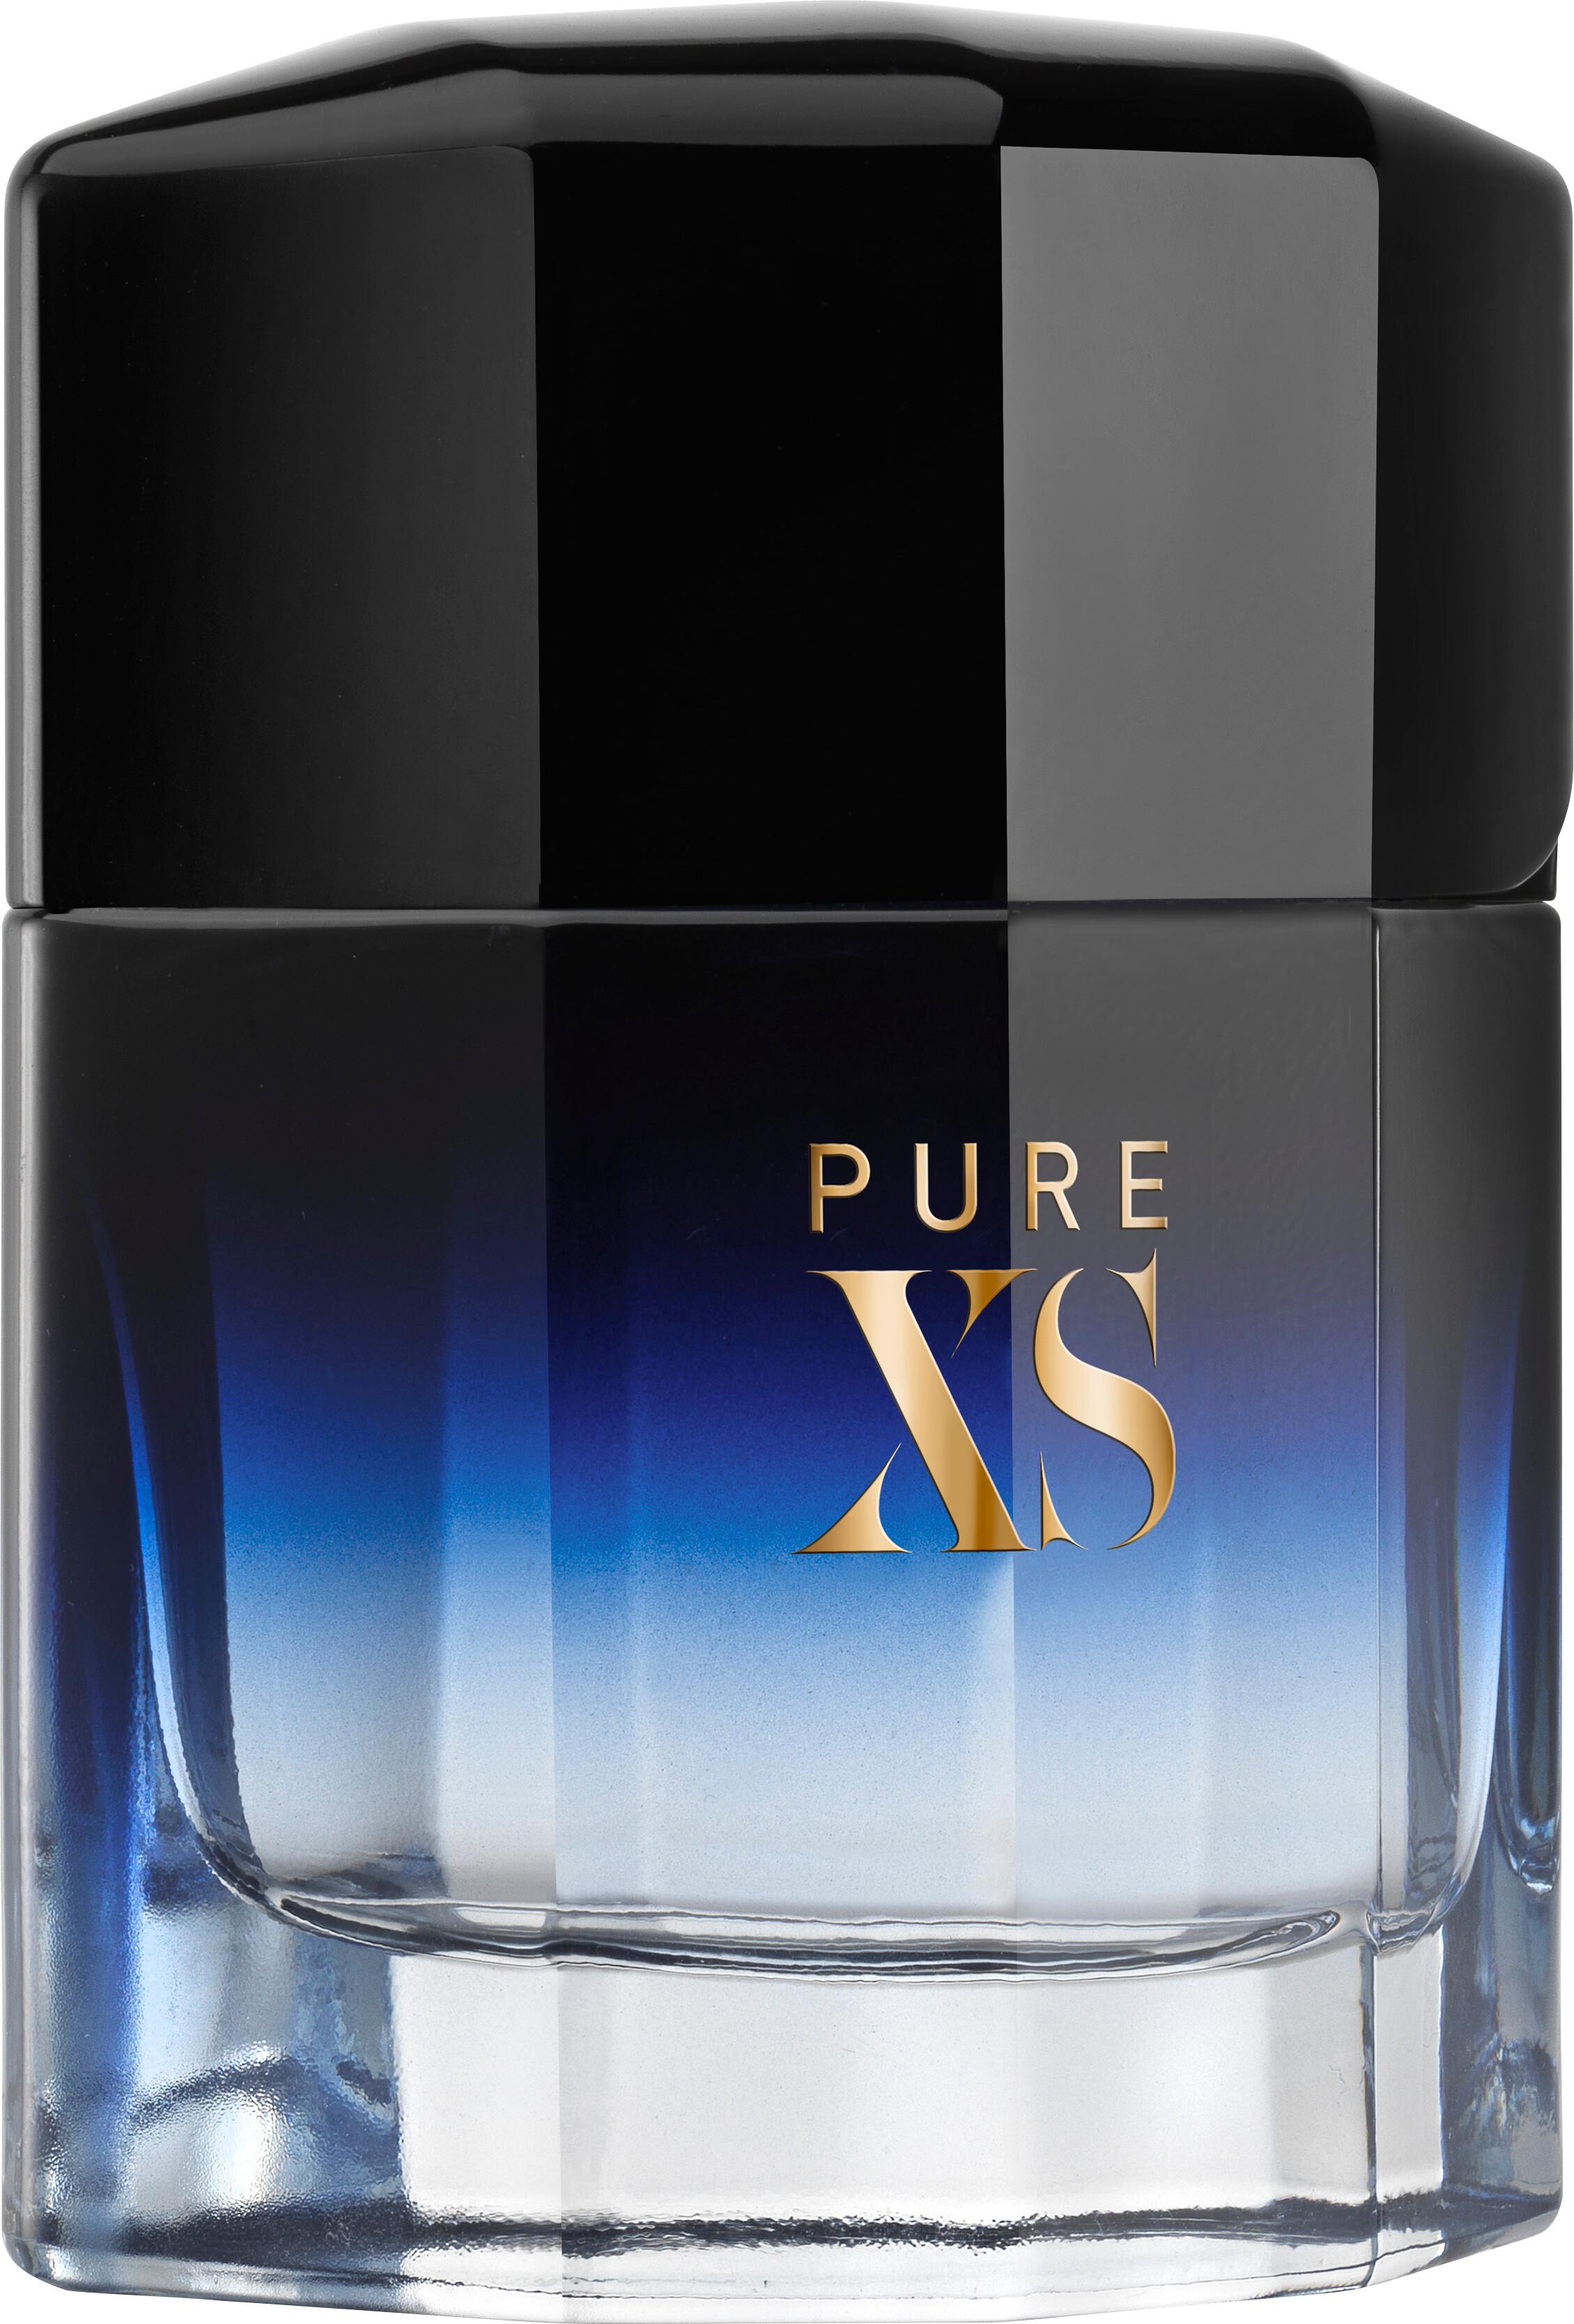 4188ece7e5 ... Paco Rabanne Pure XS Eau de Toilette Spray 100ml